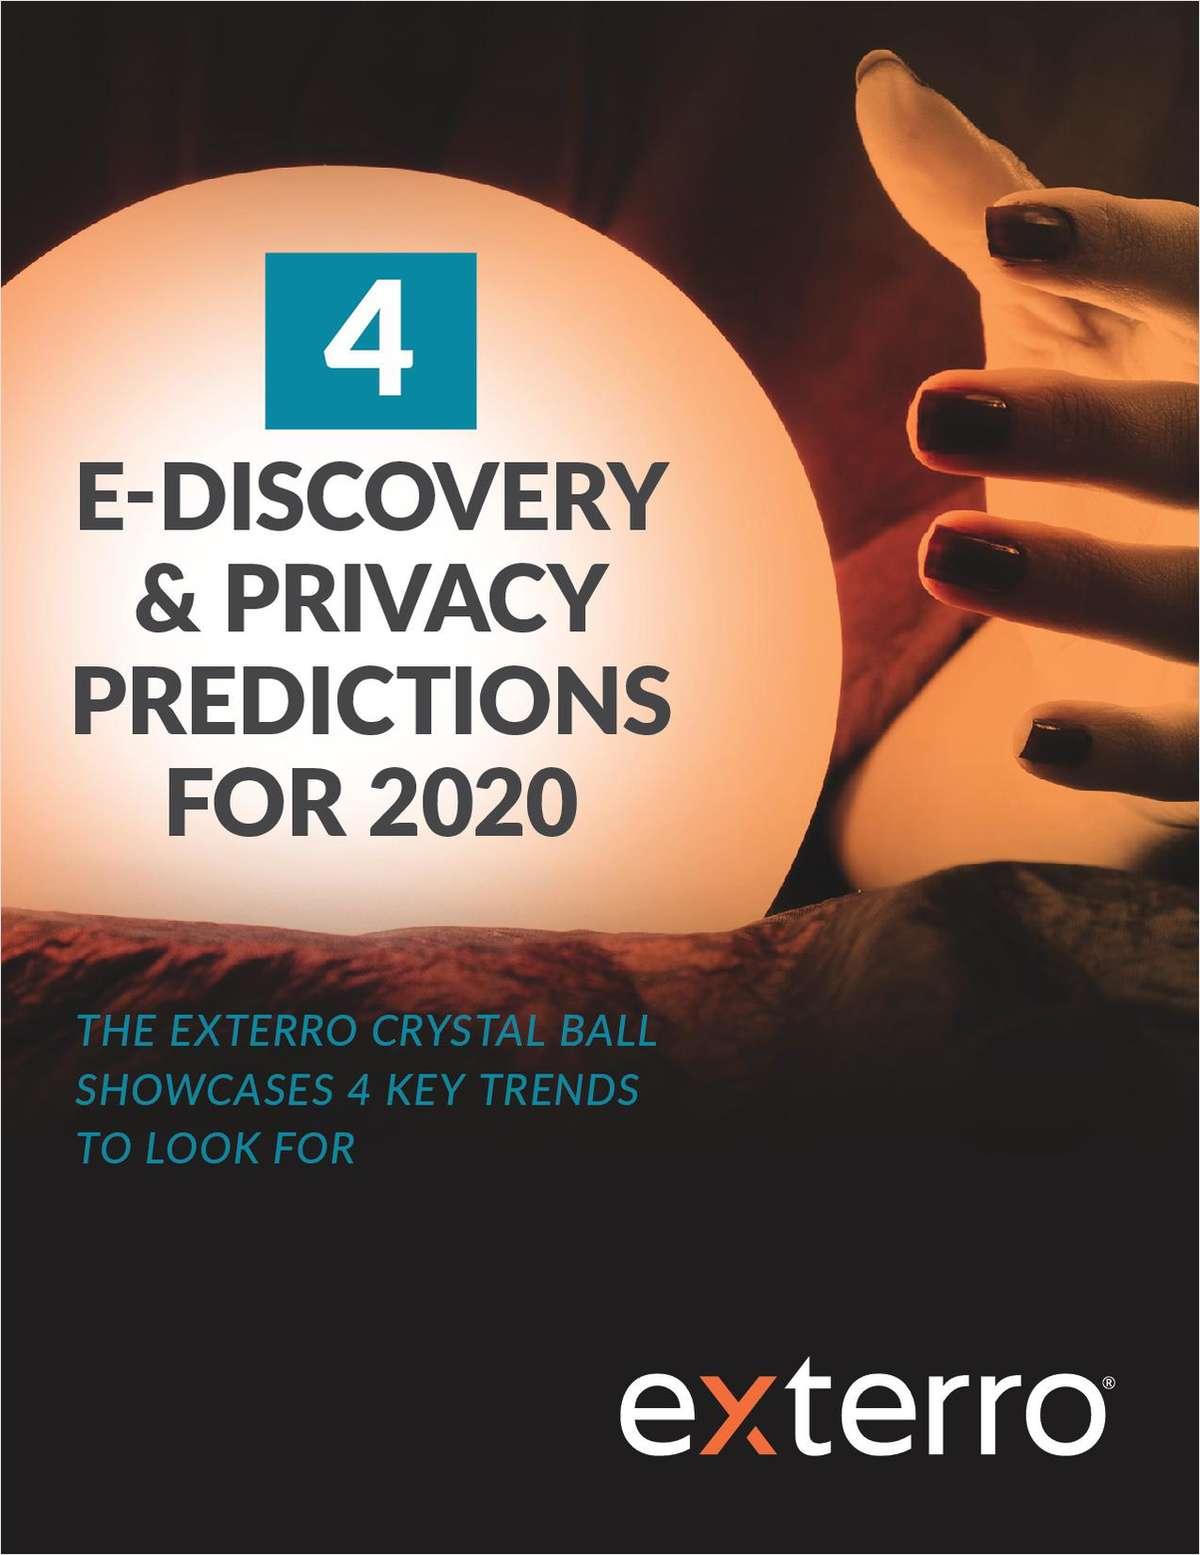 4 E-Discovery & Privacy Predictions for 2020